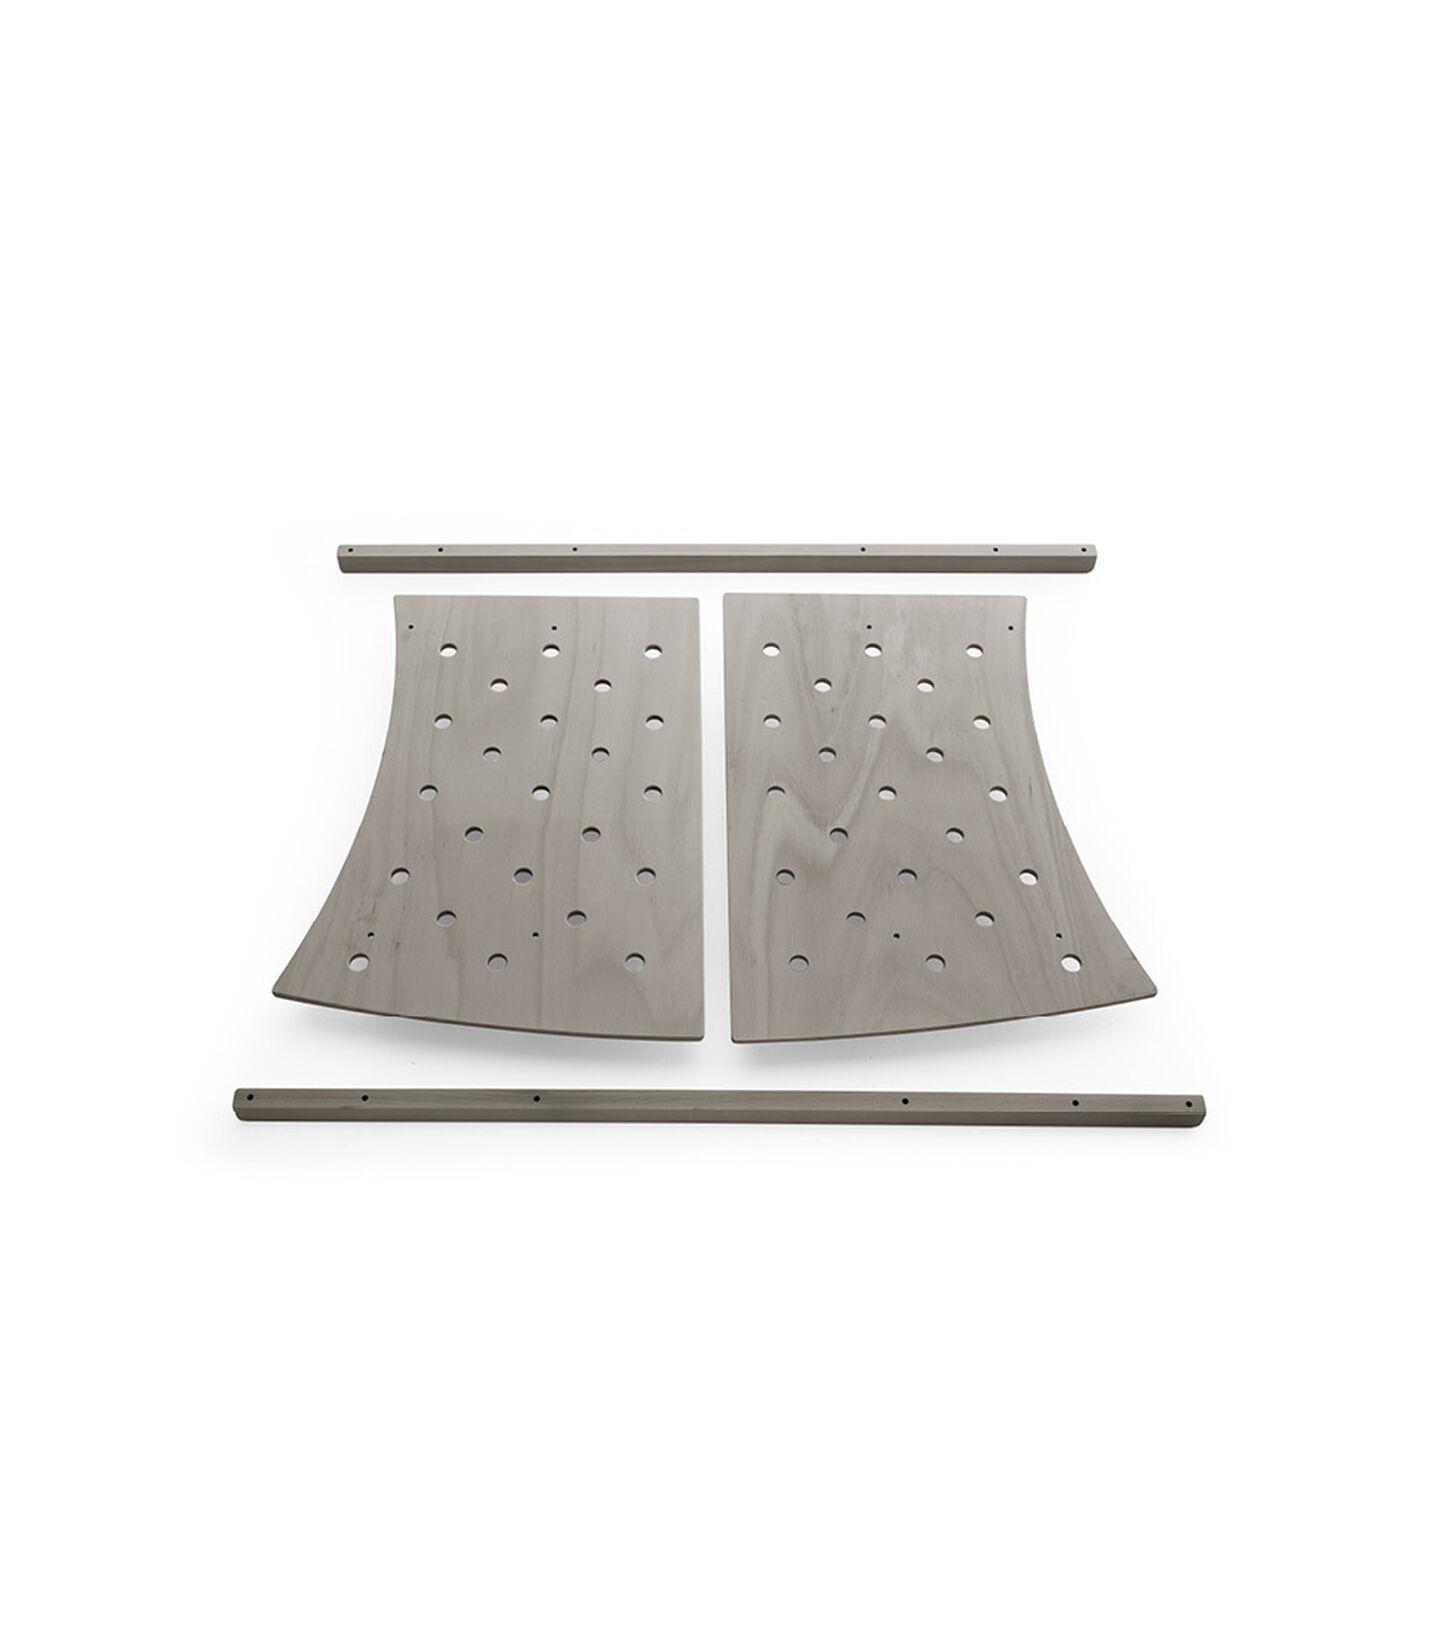 Stokke® Sleepi™ Junior Extension Kit, Hazy Grey. view 2